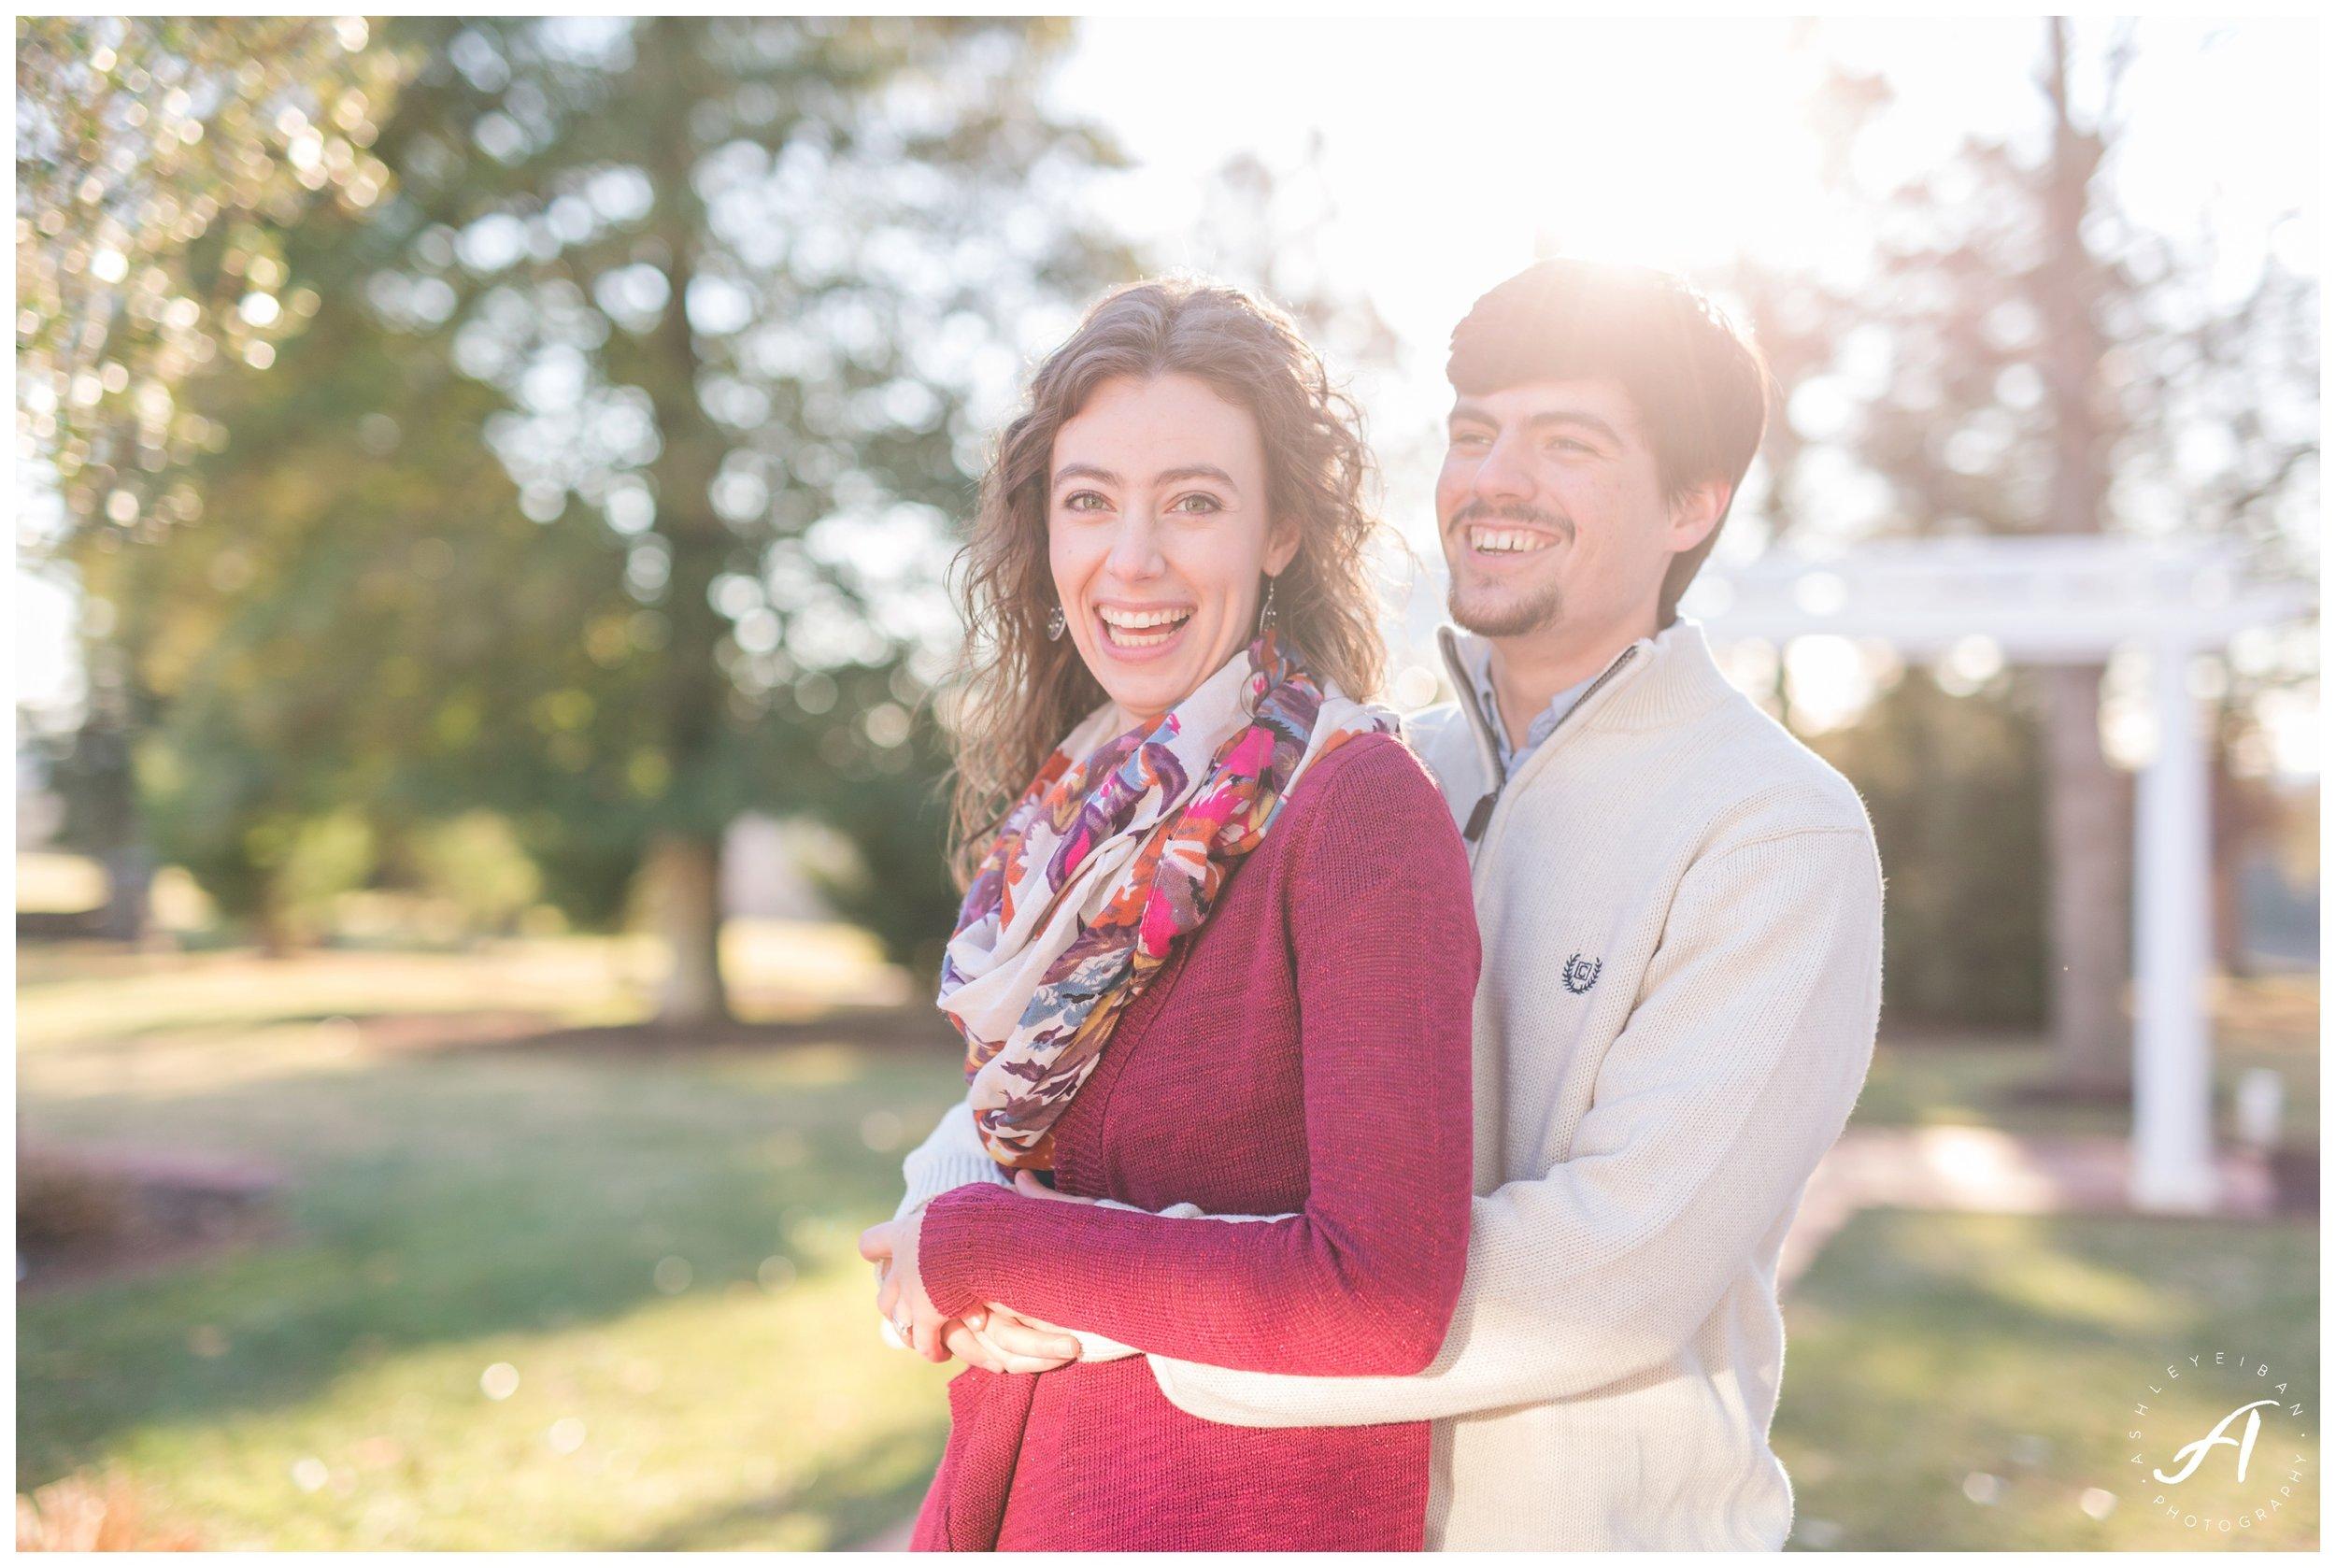 Trivium Estate Engagement Session || Lynchburg and Forest Wedding Photographer || www.ashleyeiban.com